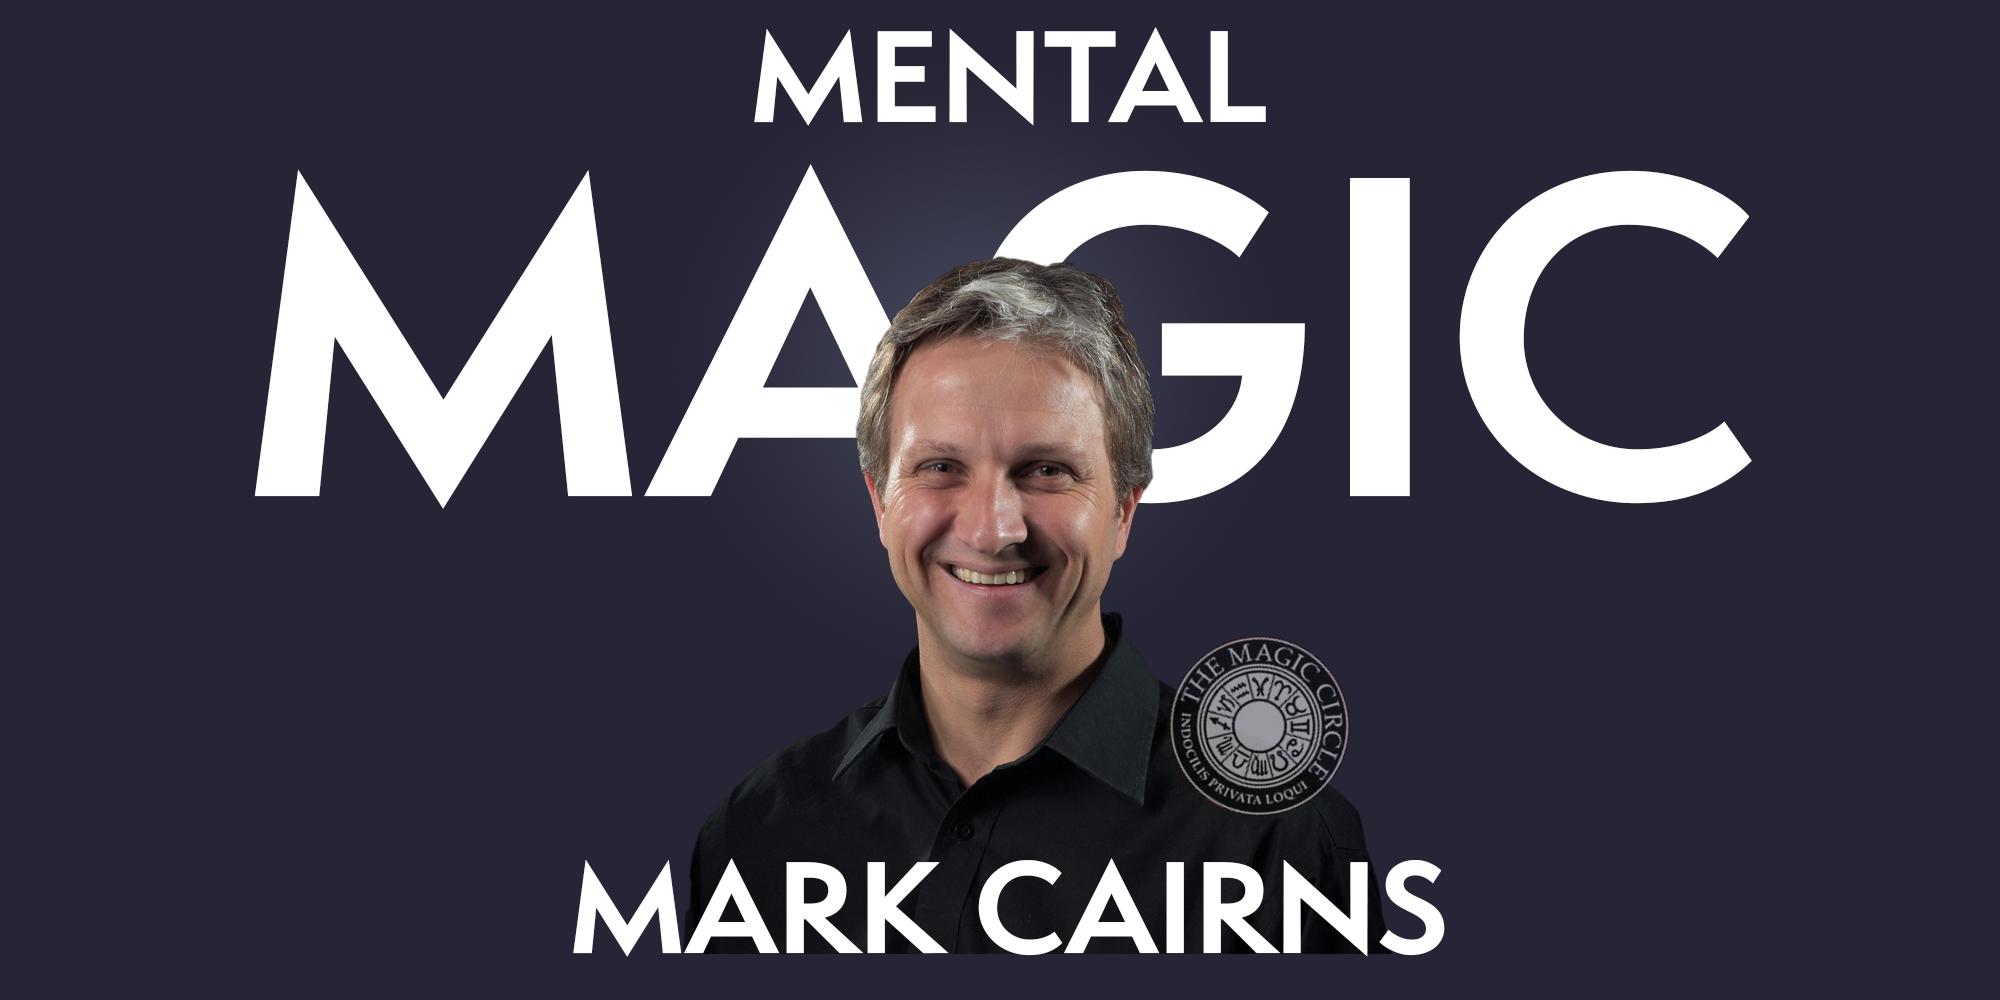 Mental Magic - Mark cairns image